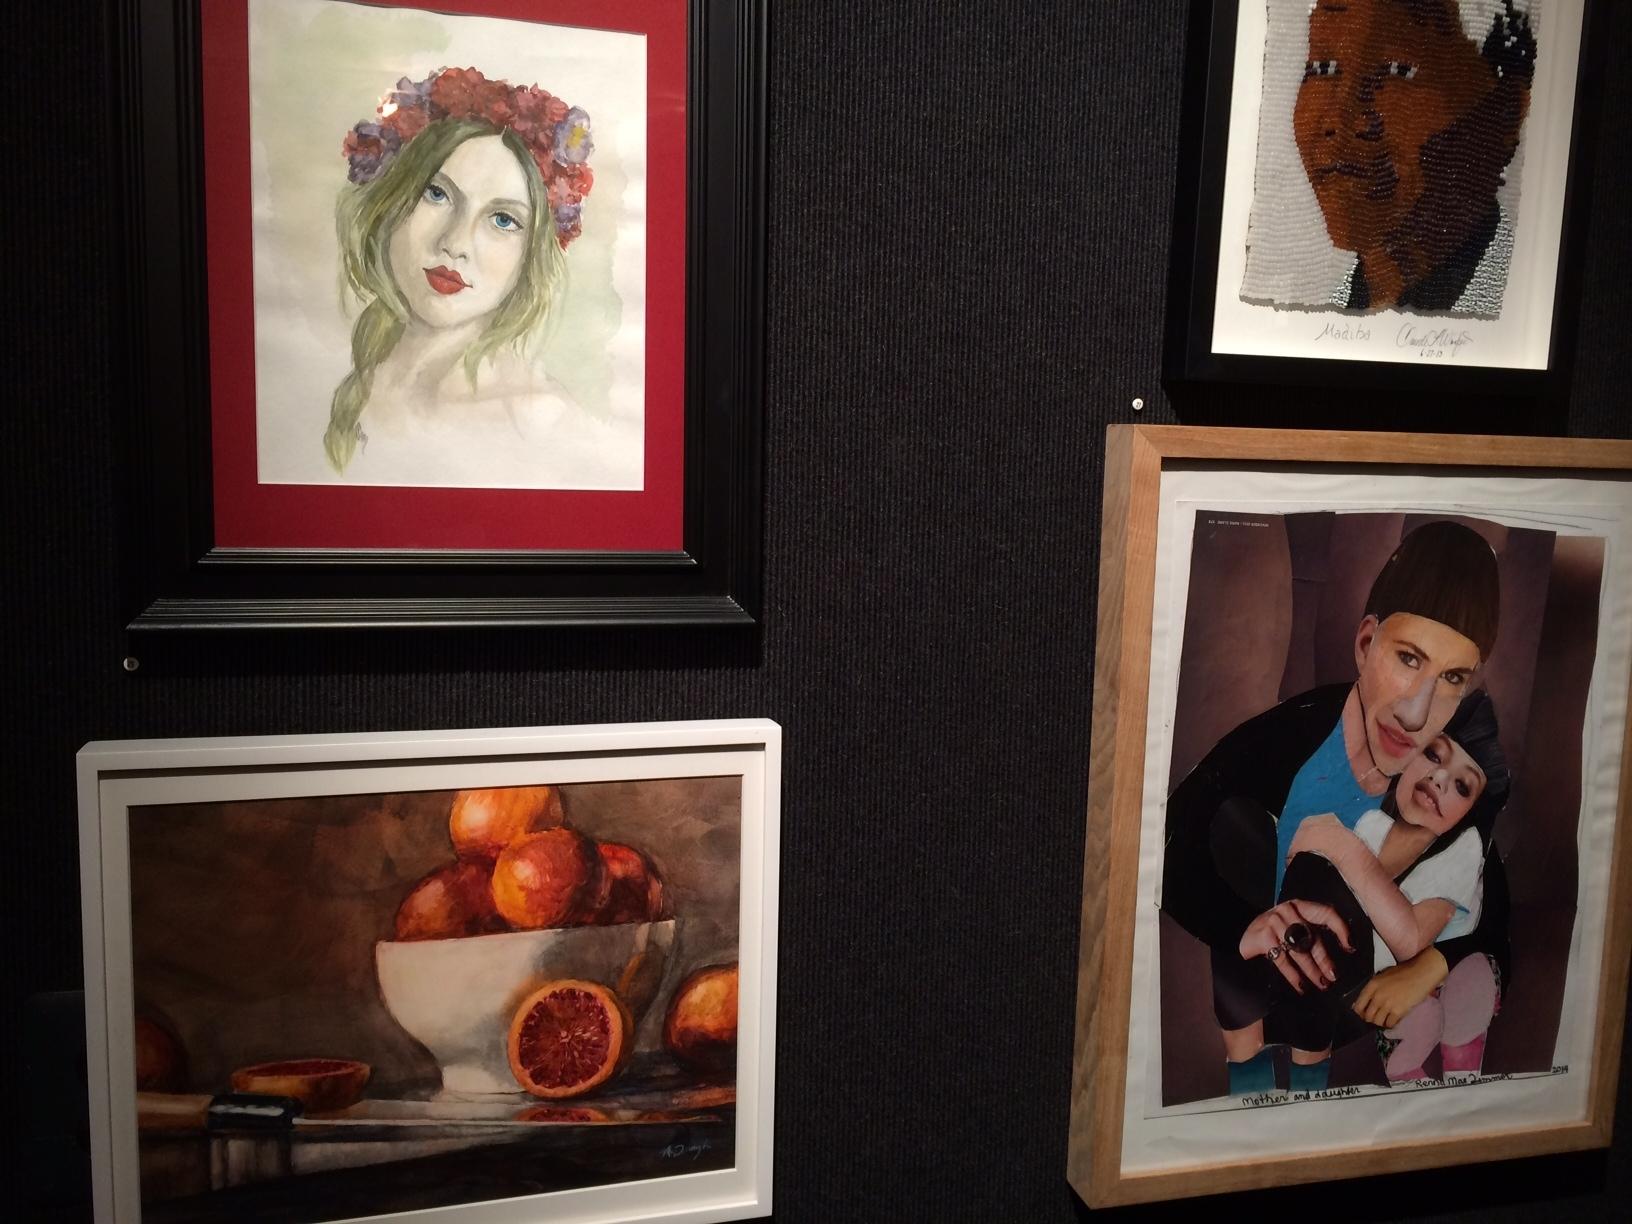 Gramercy Neighborhood Associates Art Show at the National Arts Club